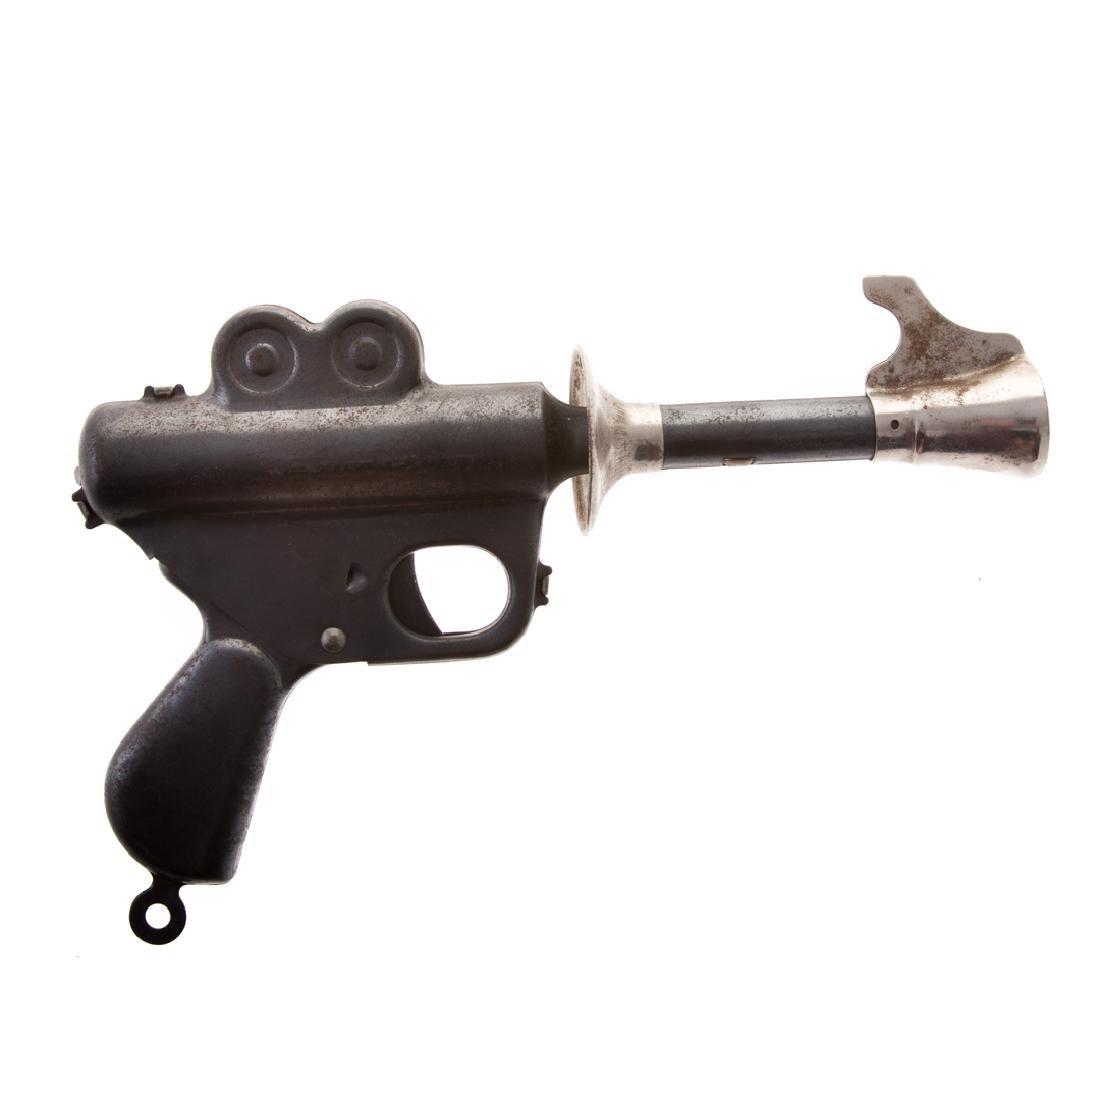 Buck Rogers 25th Century Rocket Pistol with Box - 4